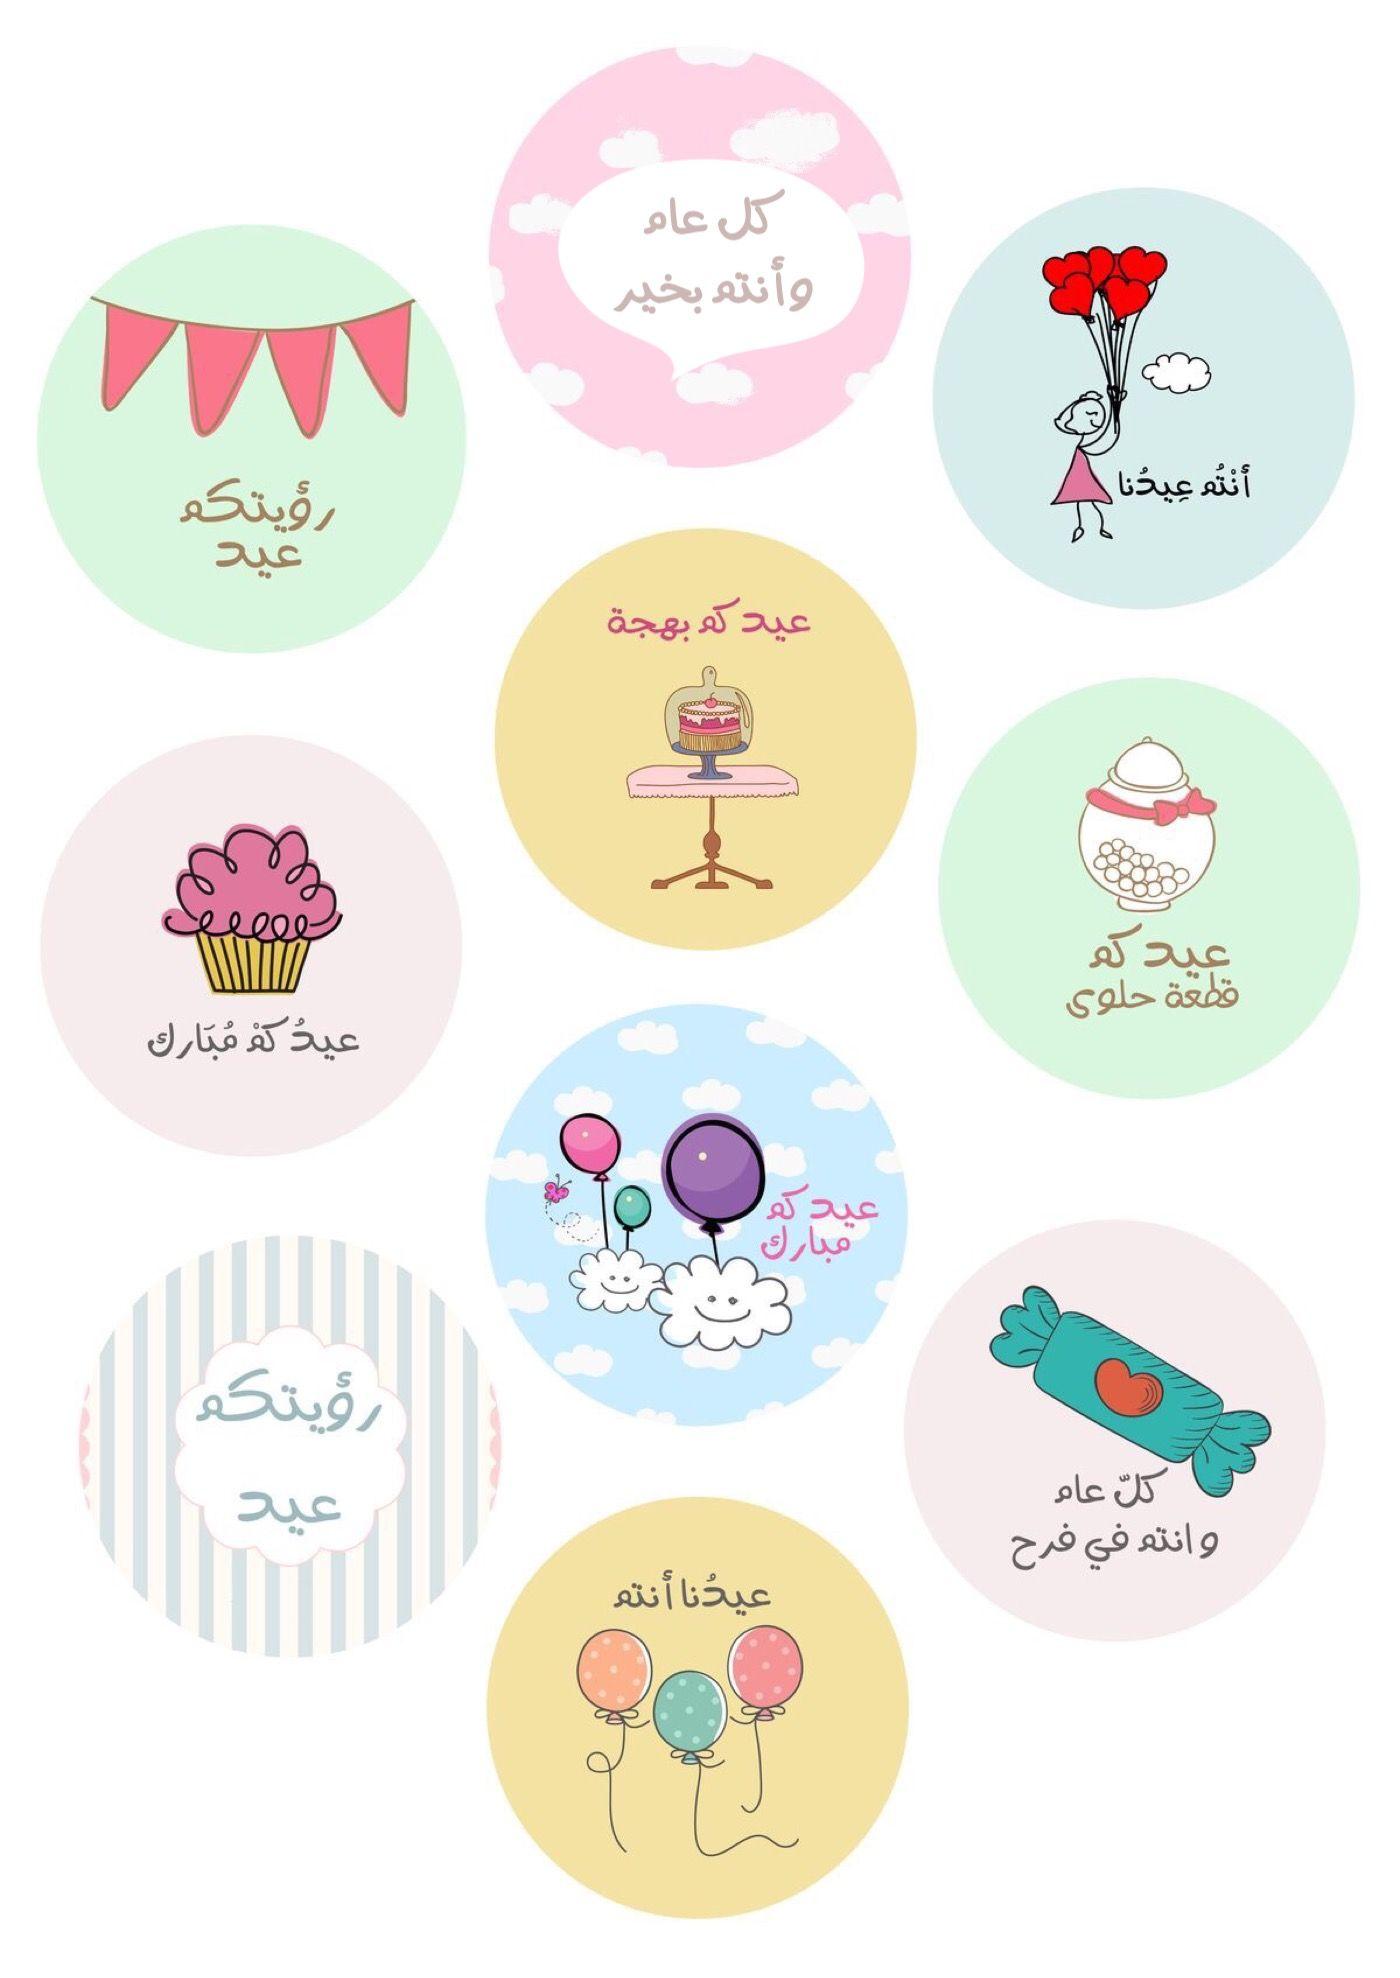 Pin By Kadijah Al Saeed On حفلات وأعياد Parties Eid Stickers Eid Cards Eid Crafts